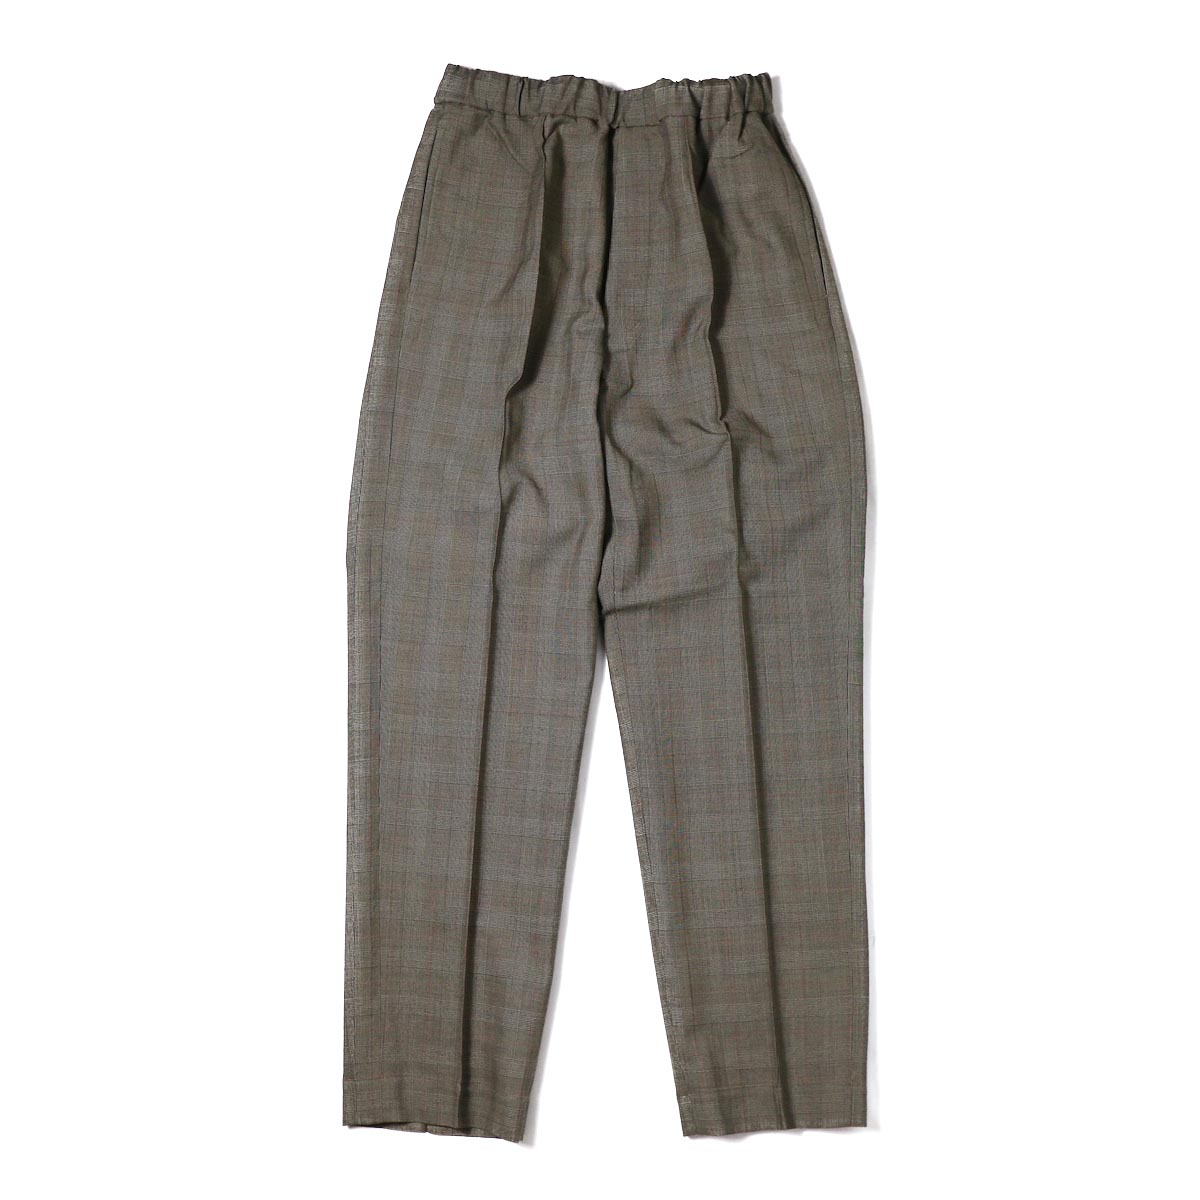 Kaptain Sunshine / Crease Tucked Easy Pants -Brown Glen Plaid